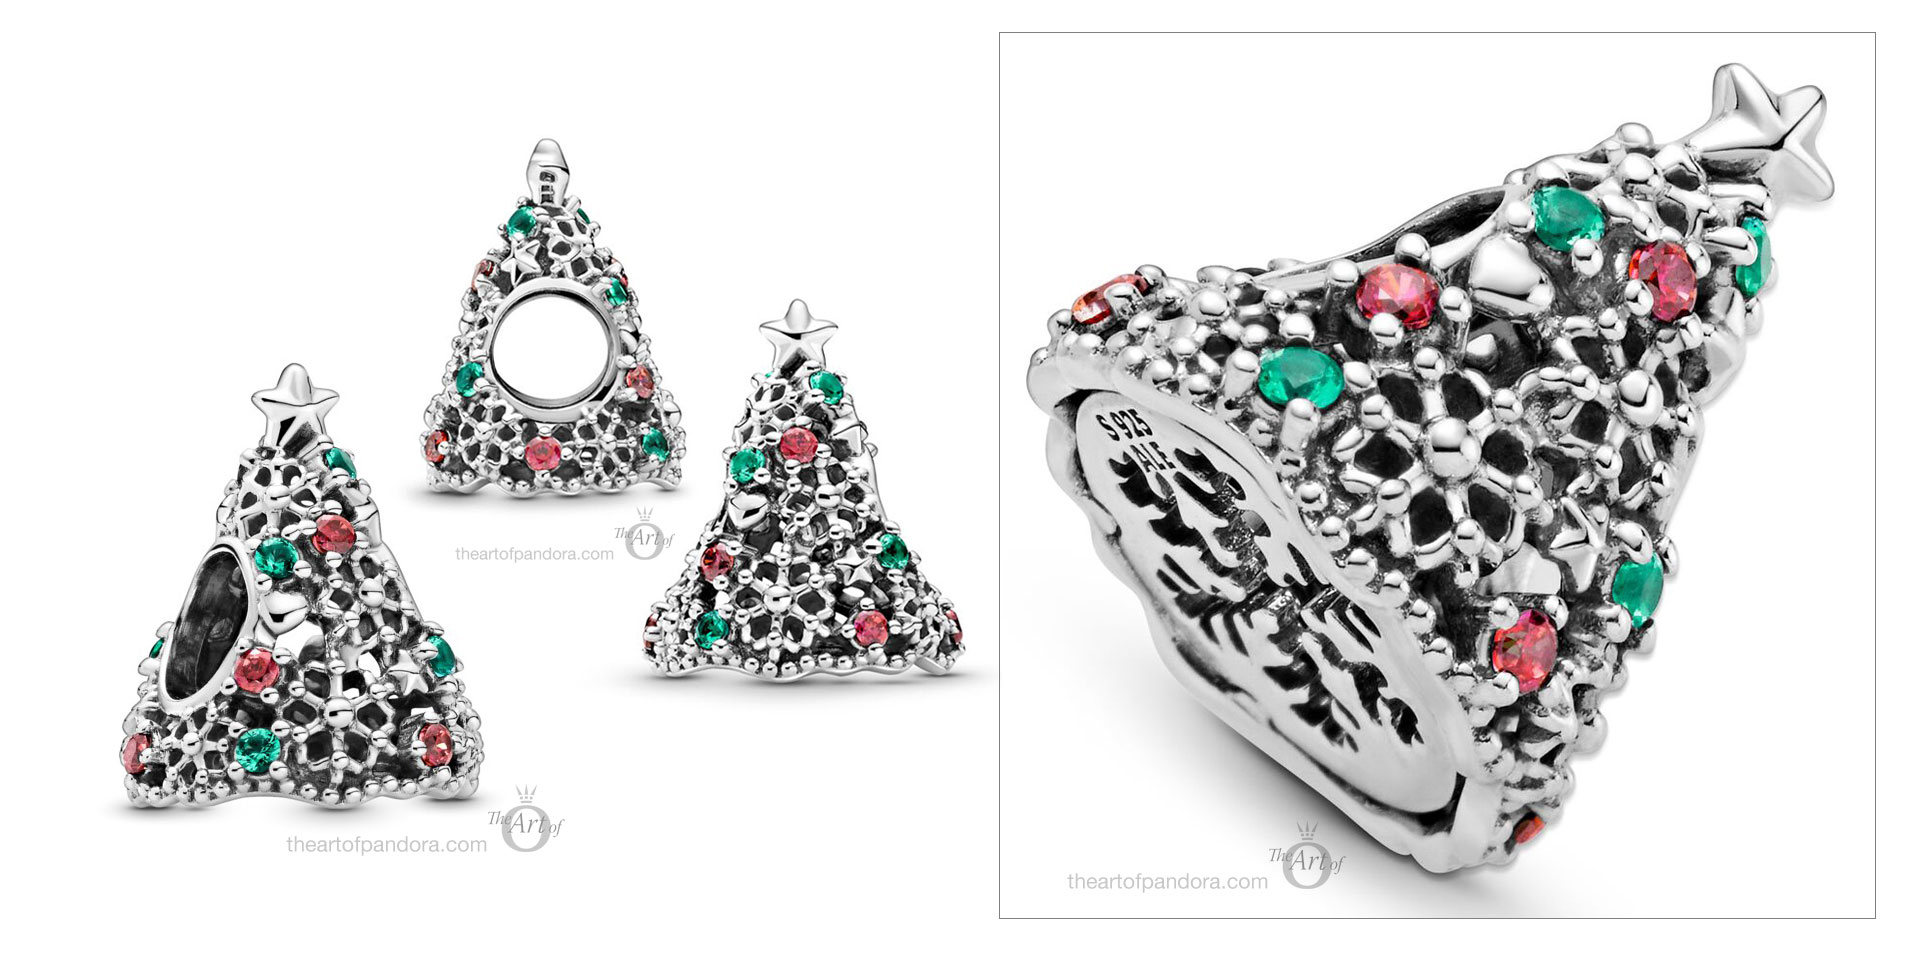 799226c01 Pandora Glitter Christmas Tree Charm The Art Of Pandora More Than Just A Pandora Blog